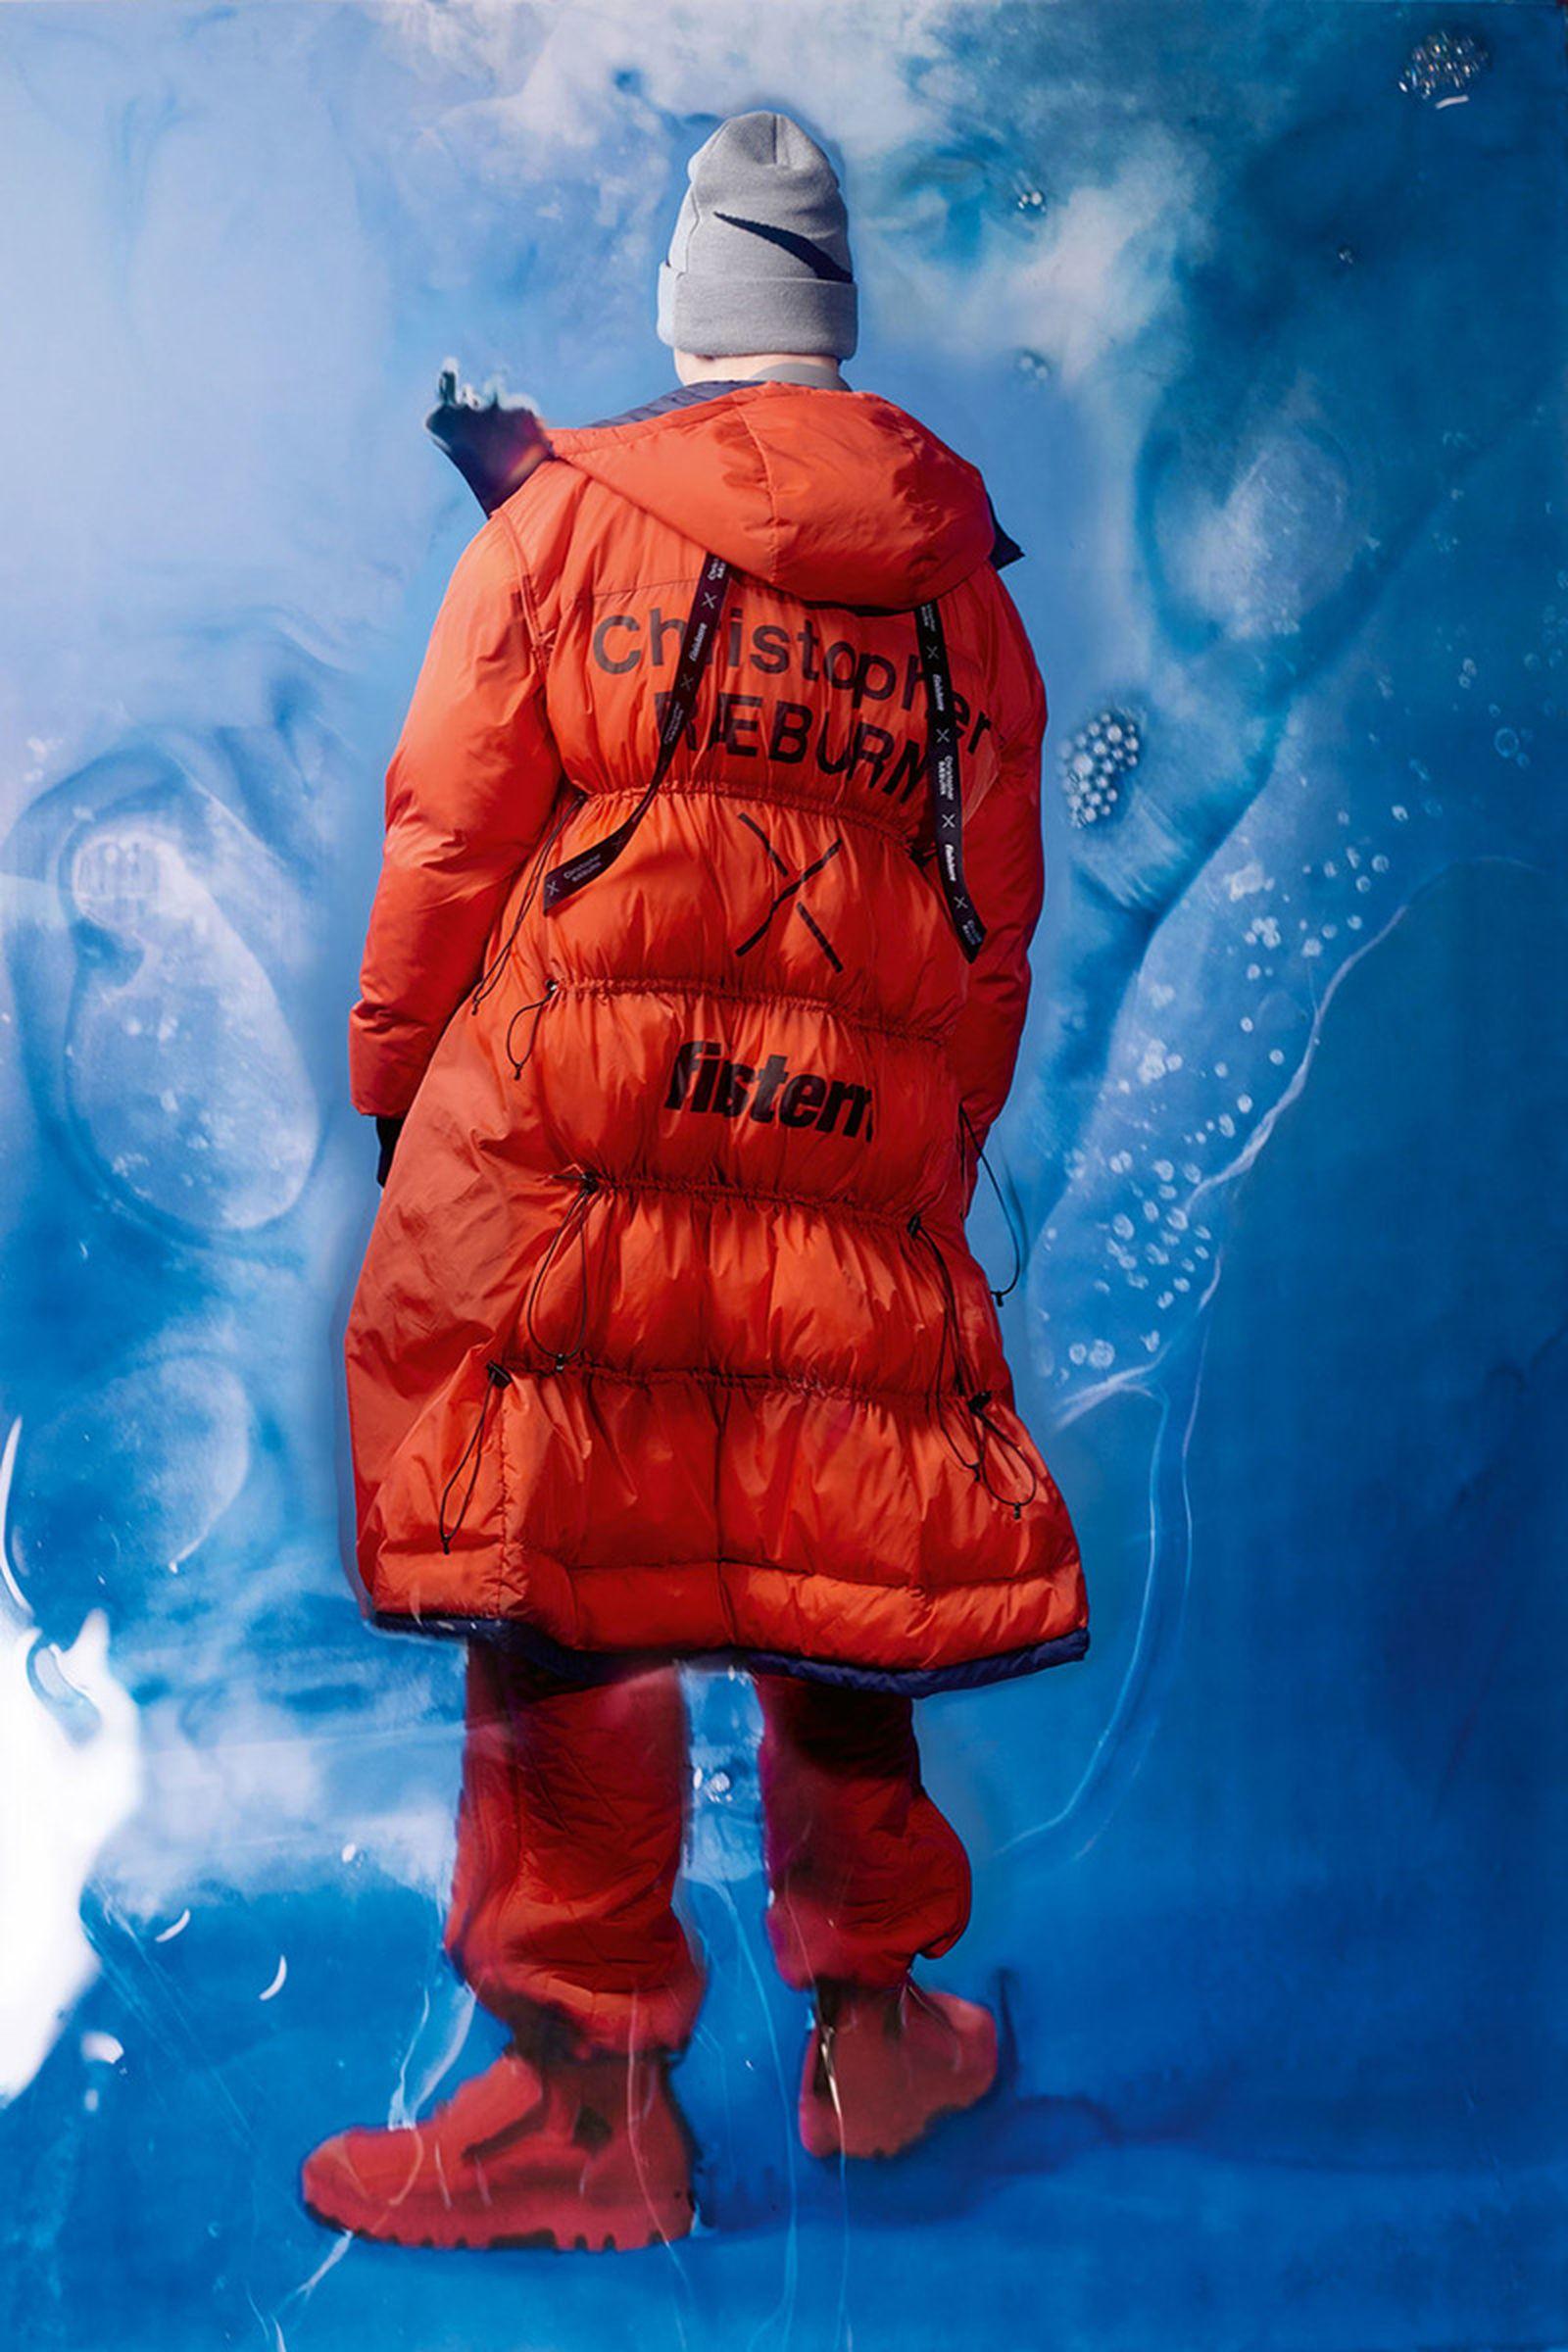 best sustainable fashion brands christopherraeburn Armedangels Jungmaven Knowledge Cotton Apparel